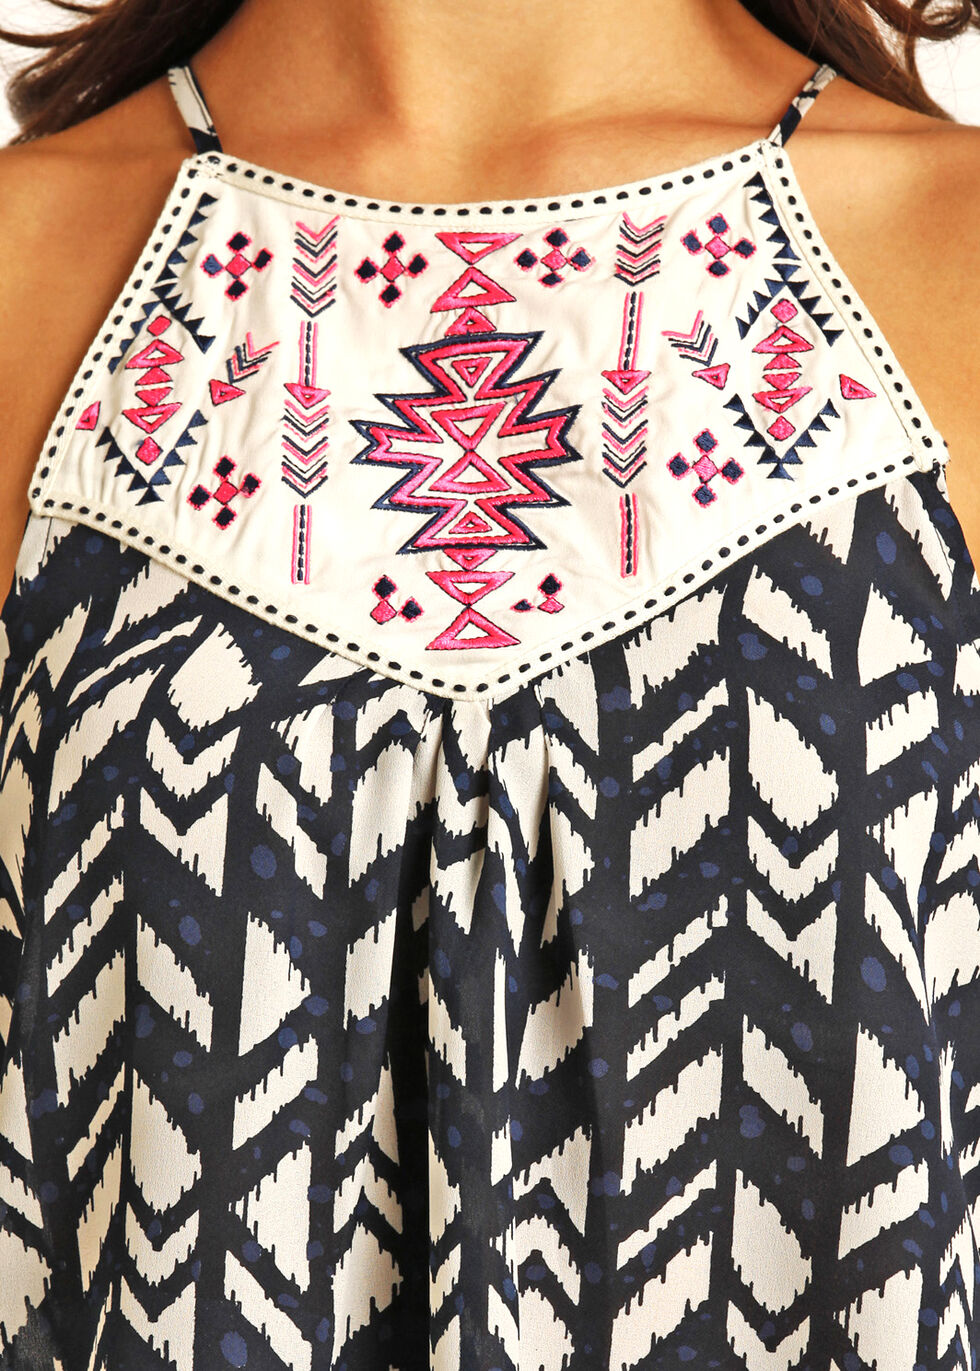 Rock & Roll Cowgirl Women's Navy Sleeveless Printed Chiffon Top, Navy, hi-res